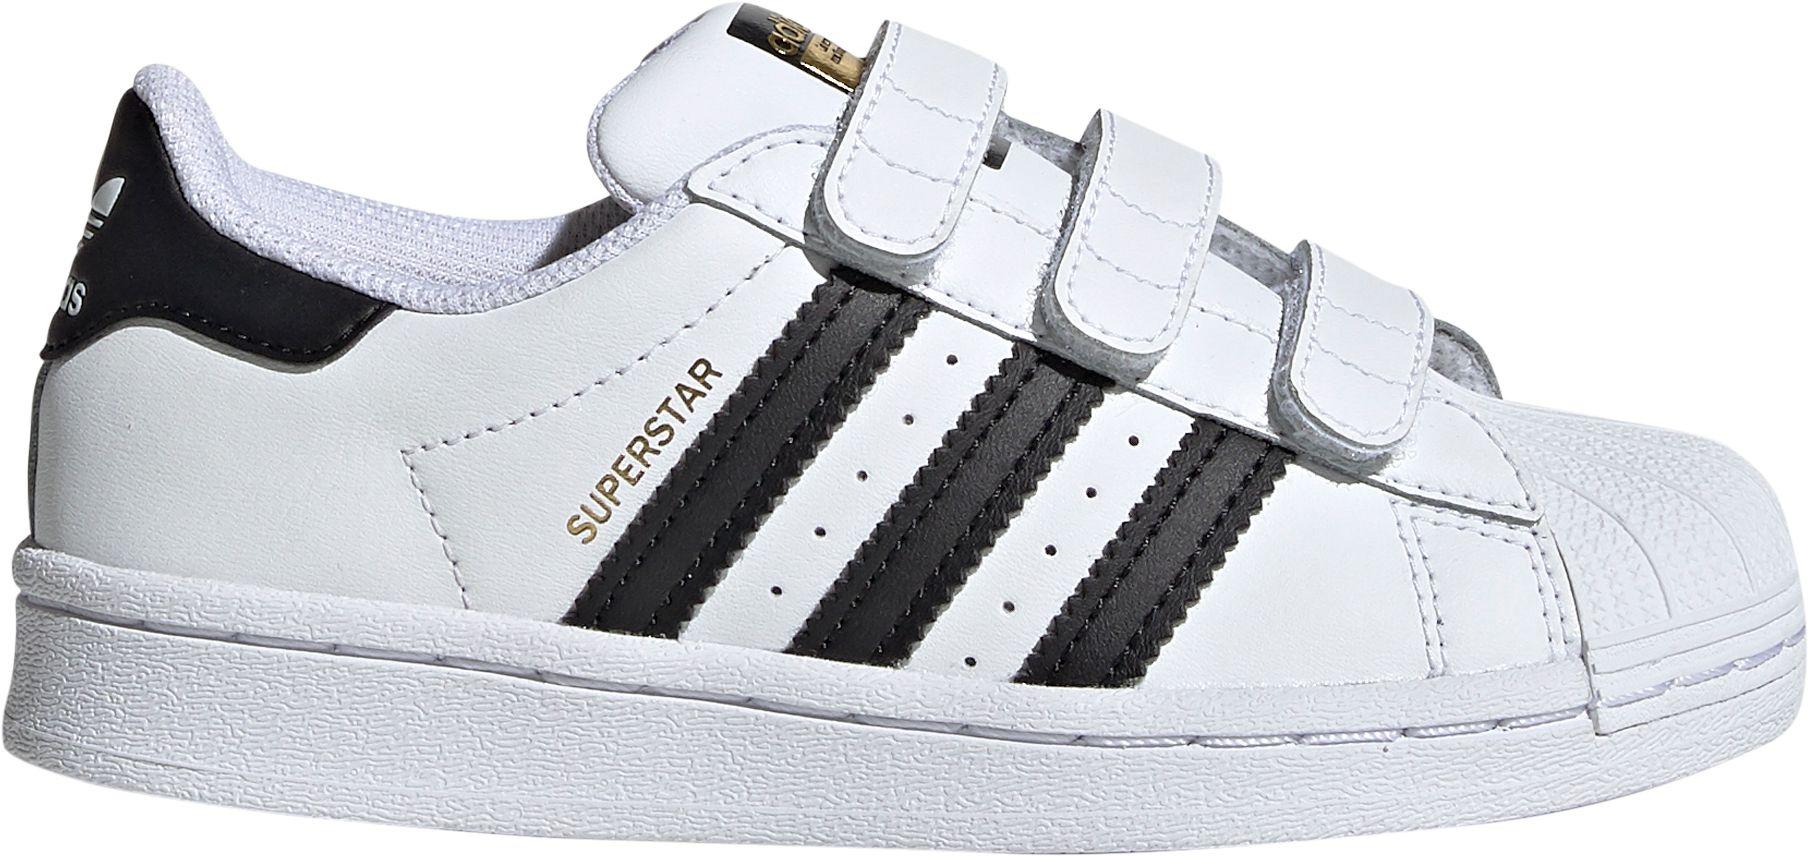 separation shoes 0ec73 7d1c8 dicks sporting goods adidas superstar